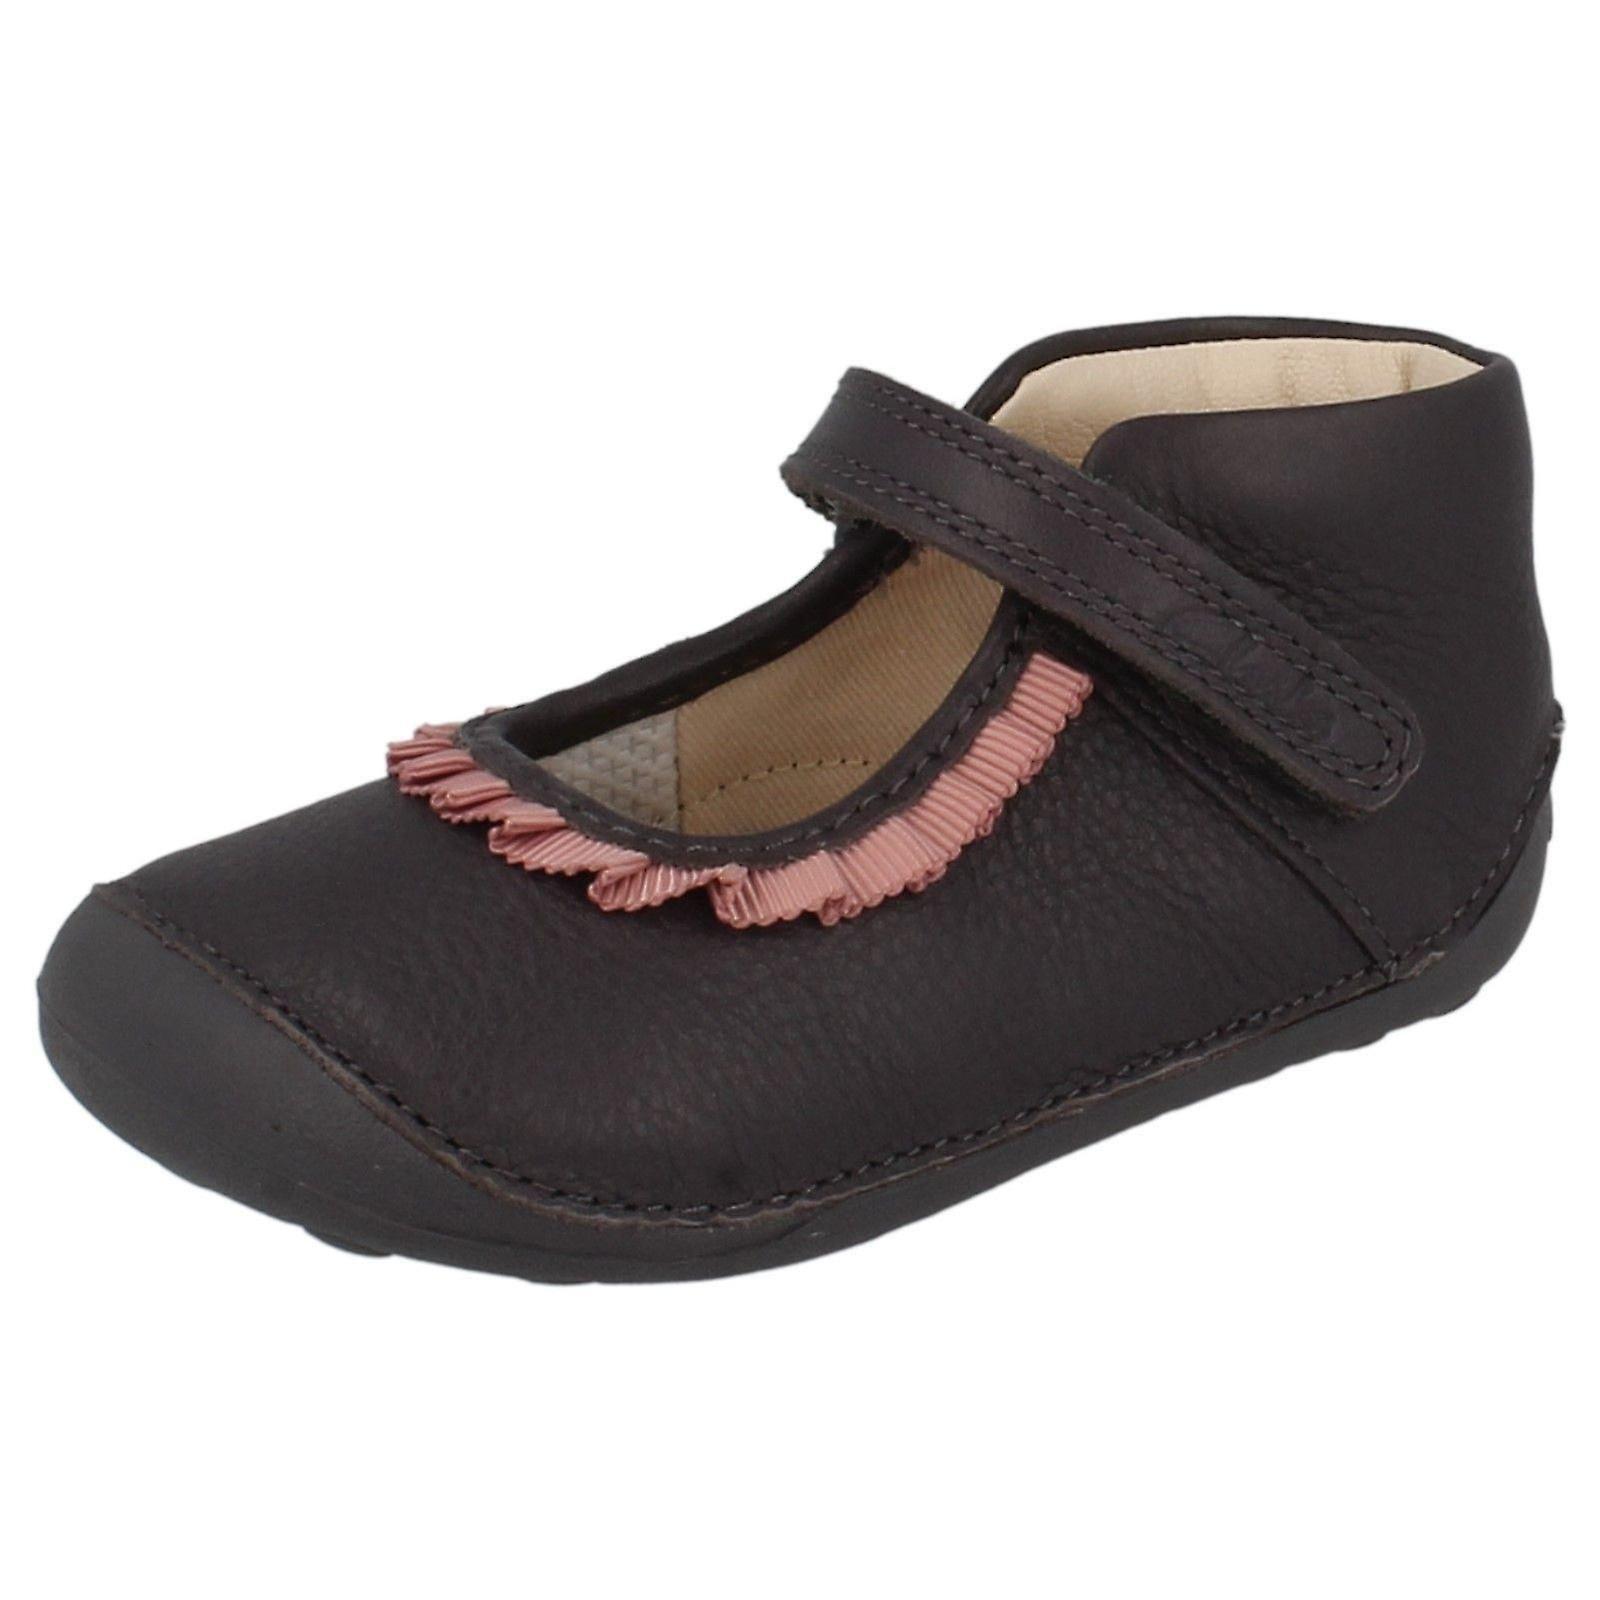 Girls Stef Clarks First Shoes Little Stef Girls cbeb0c